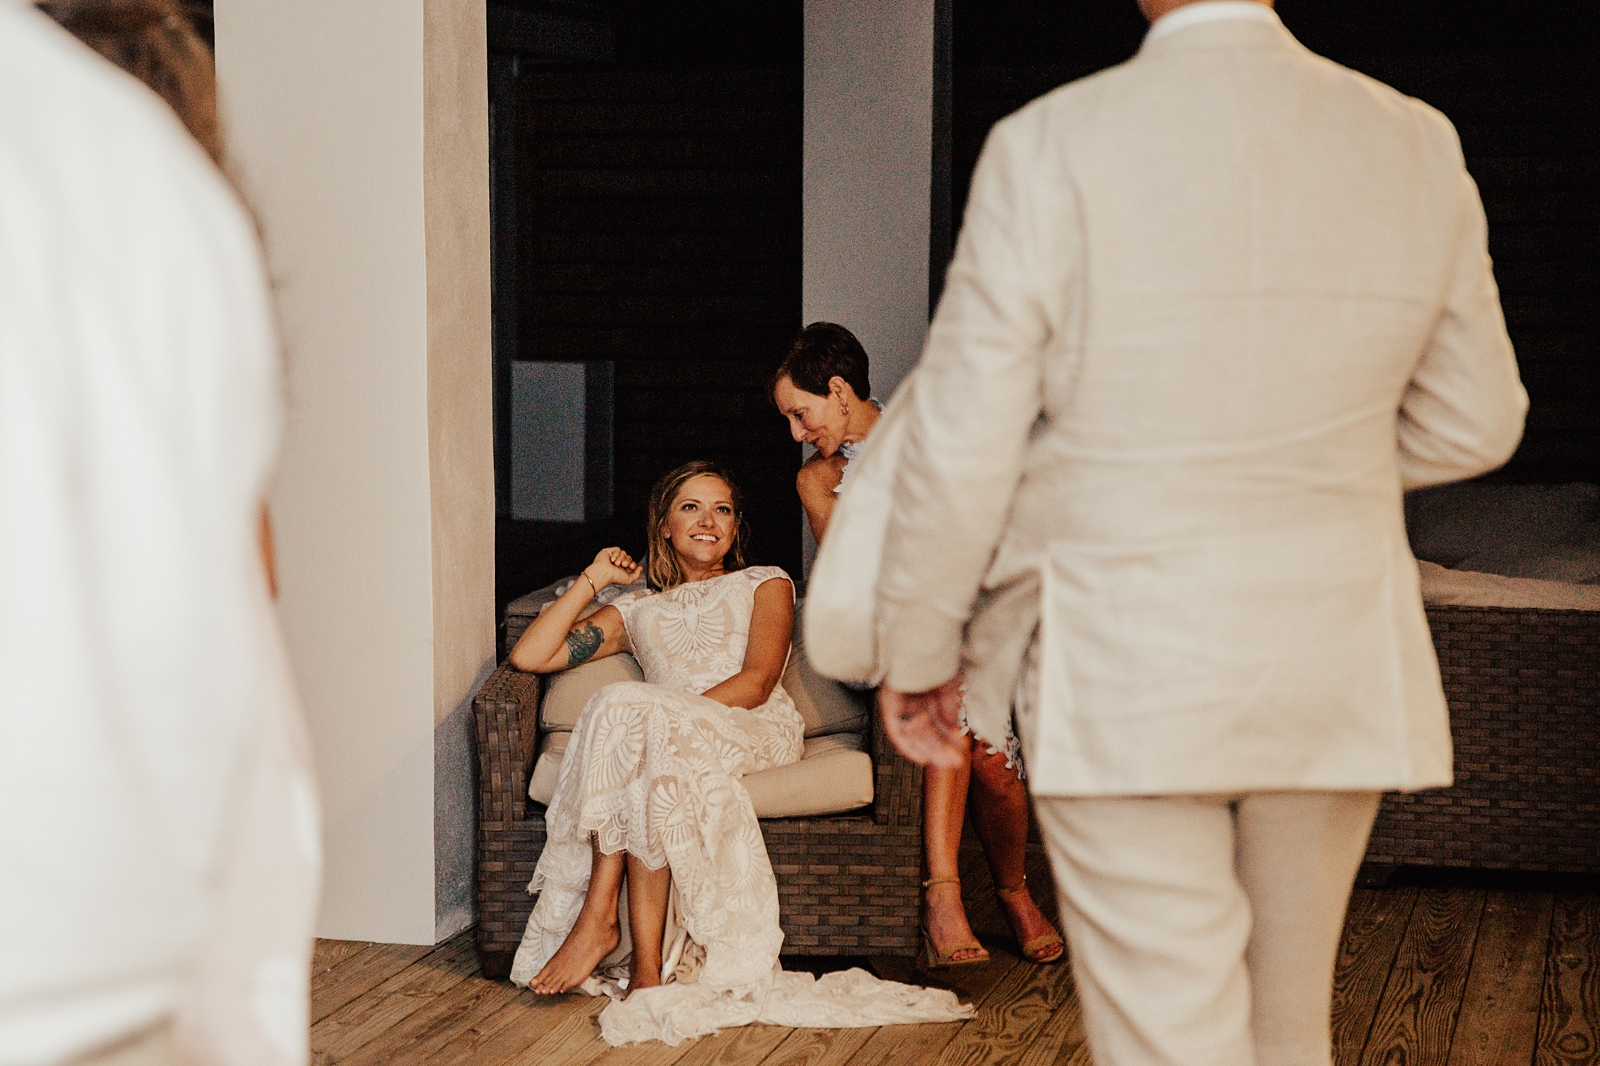 Jenni & Andrew Intimate Beach Destination Wedding in Little Exuma, Bahamas_0544.jpg